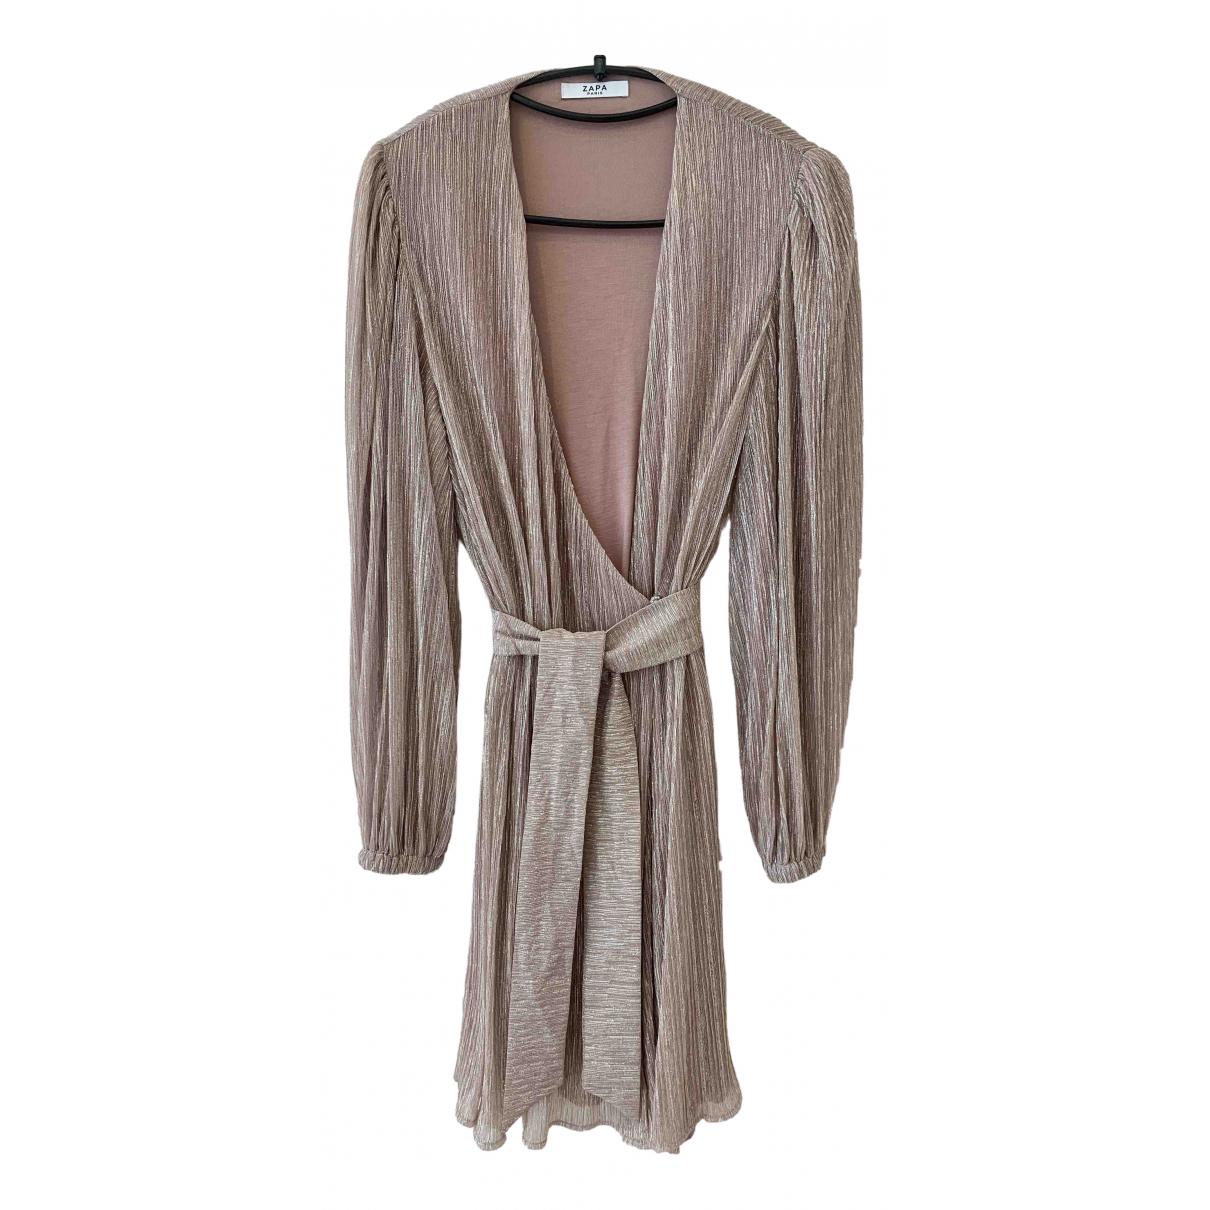 Zapa \N Kleid in  Beige Mit Pailletten